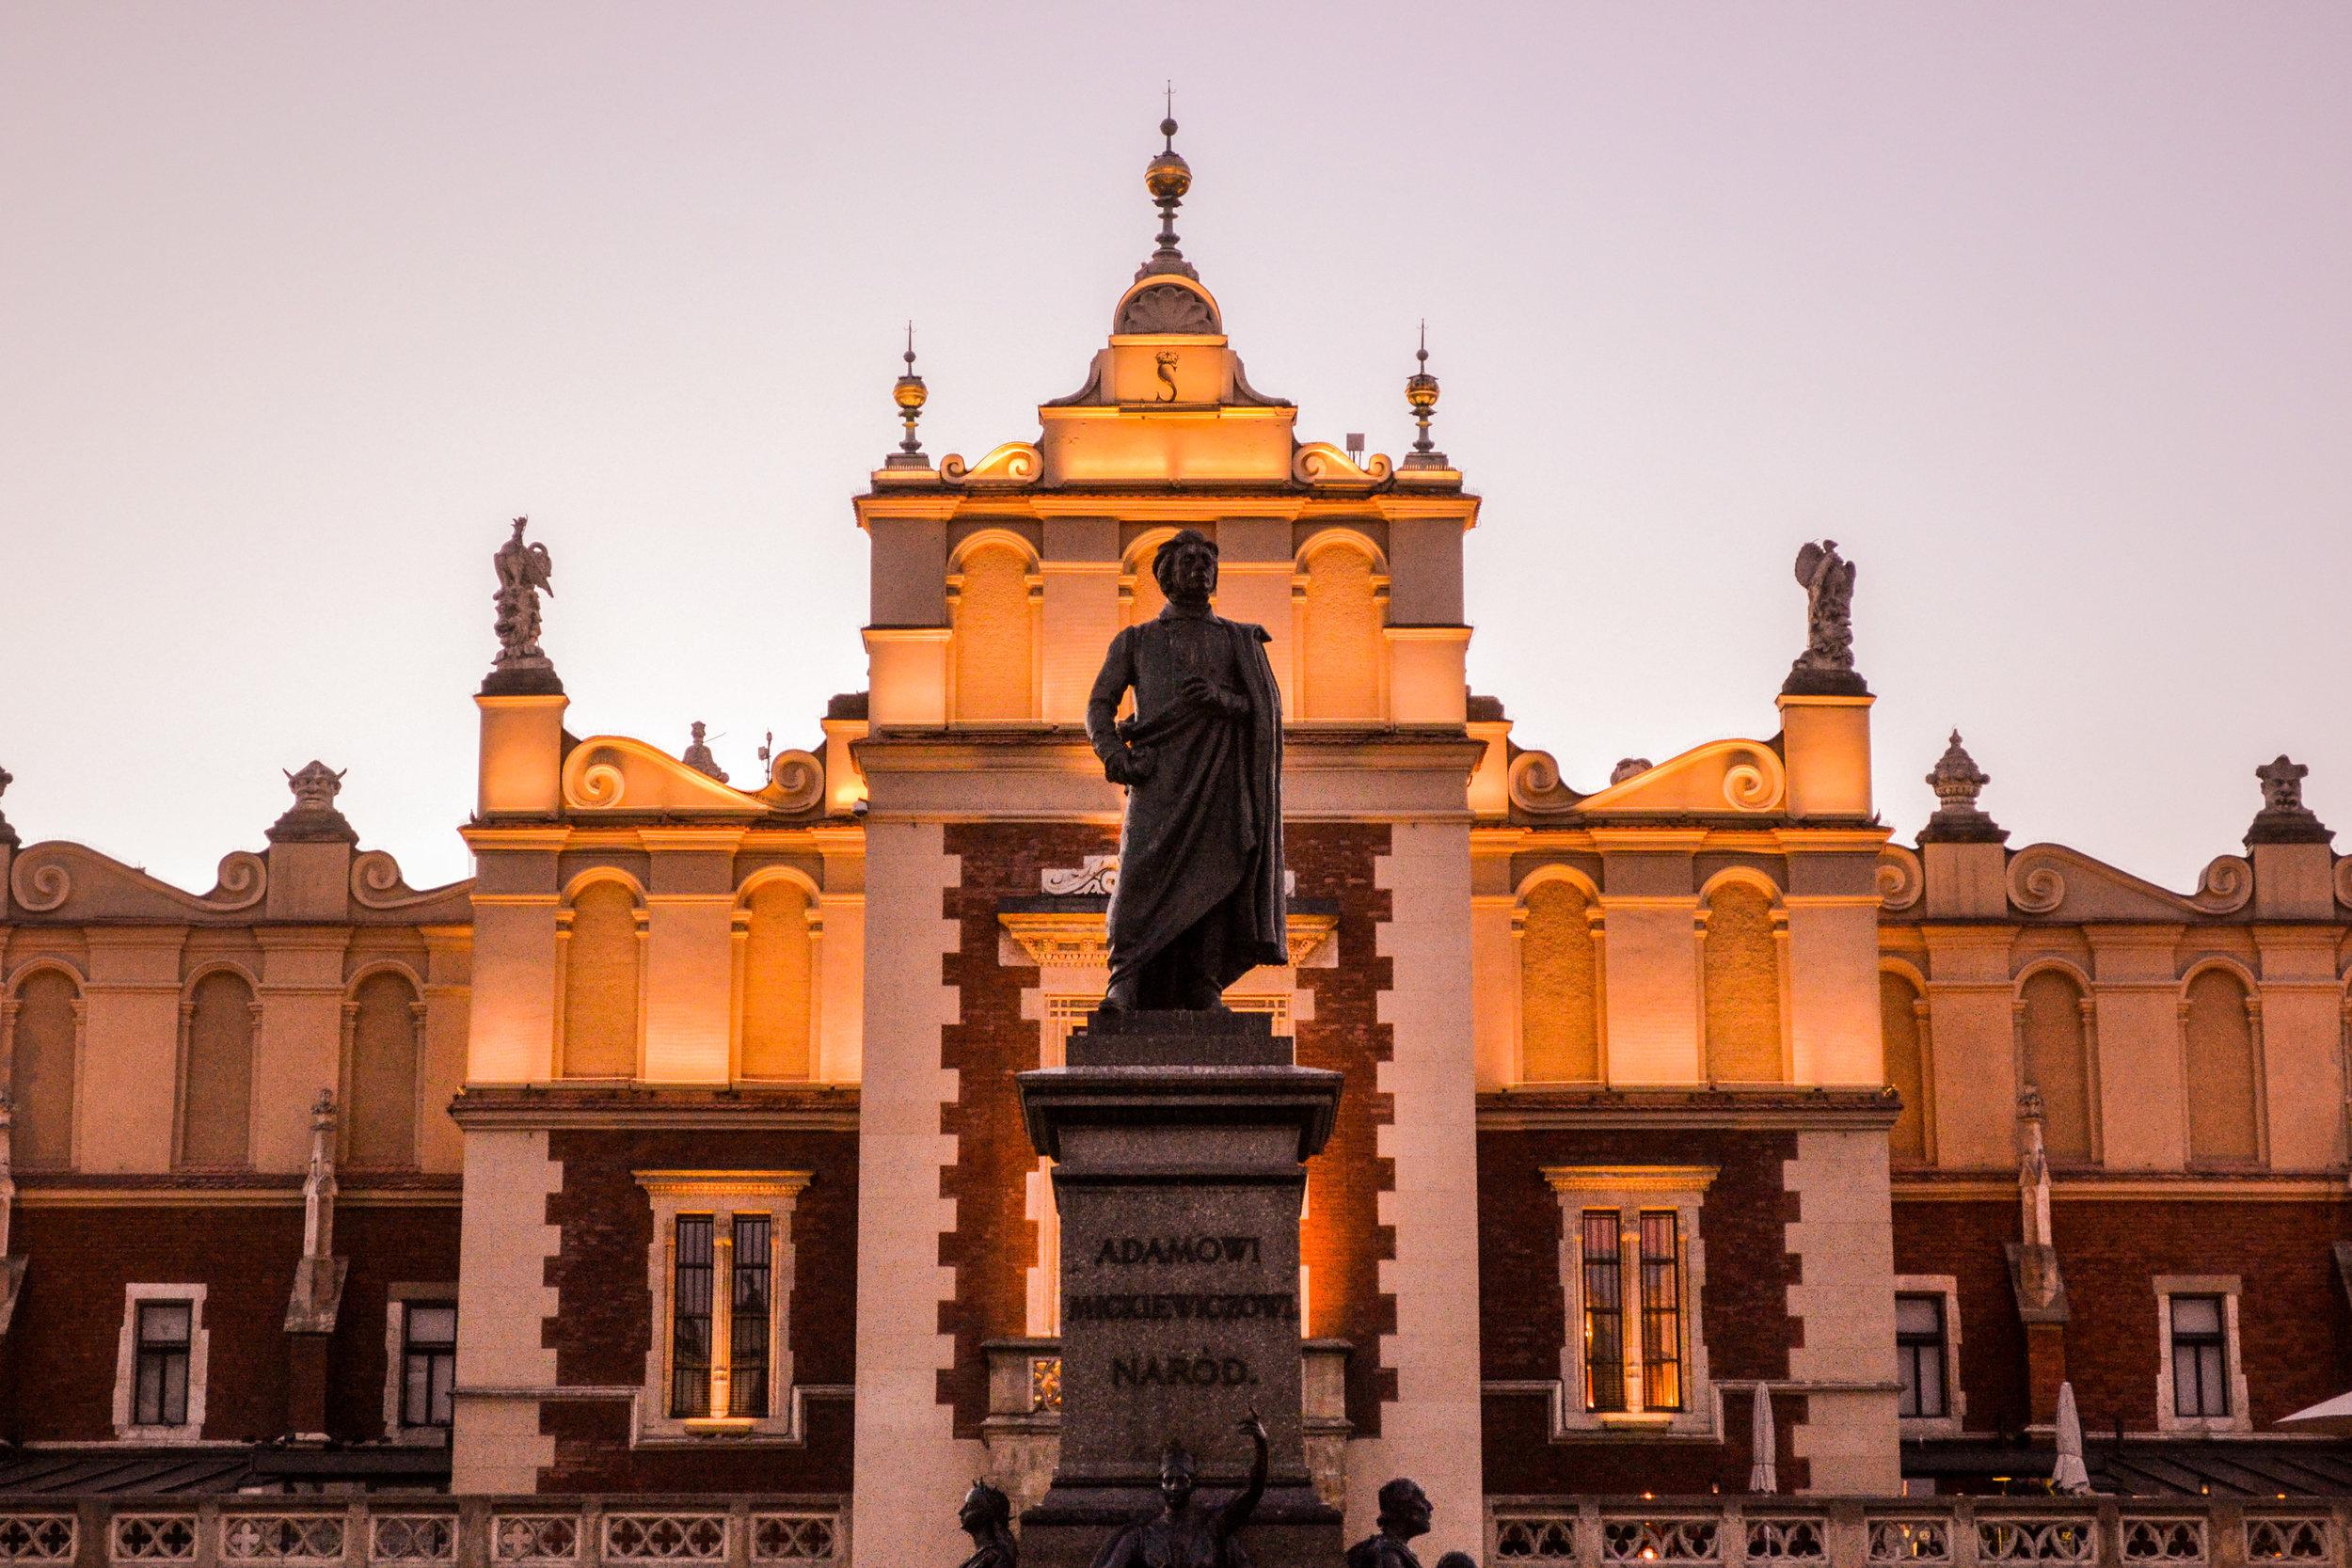 Adamowi Statue Krakow.jpg